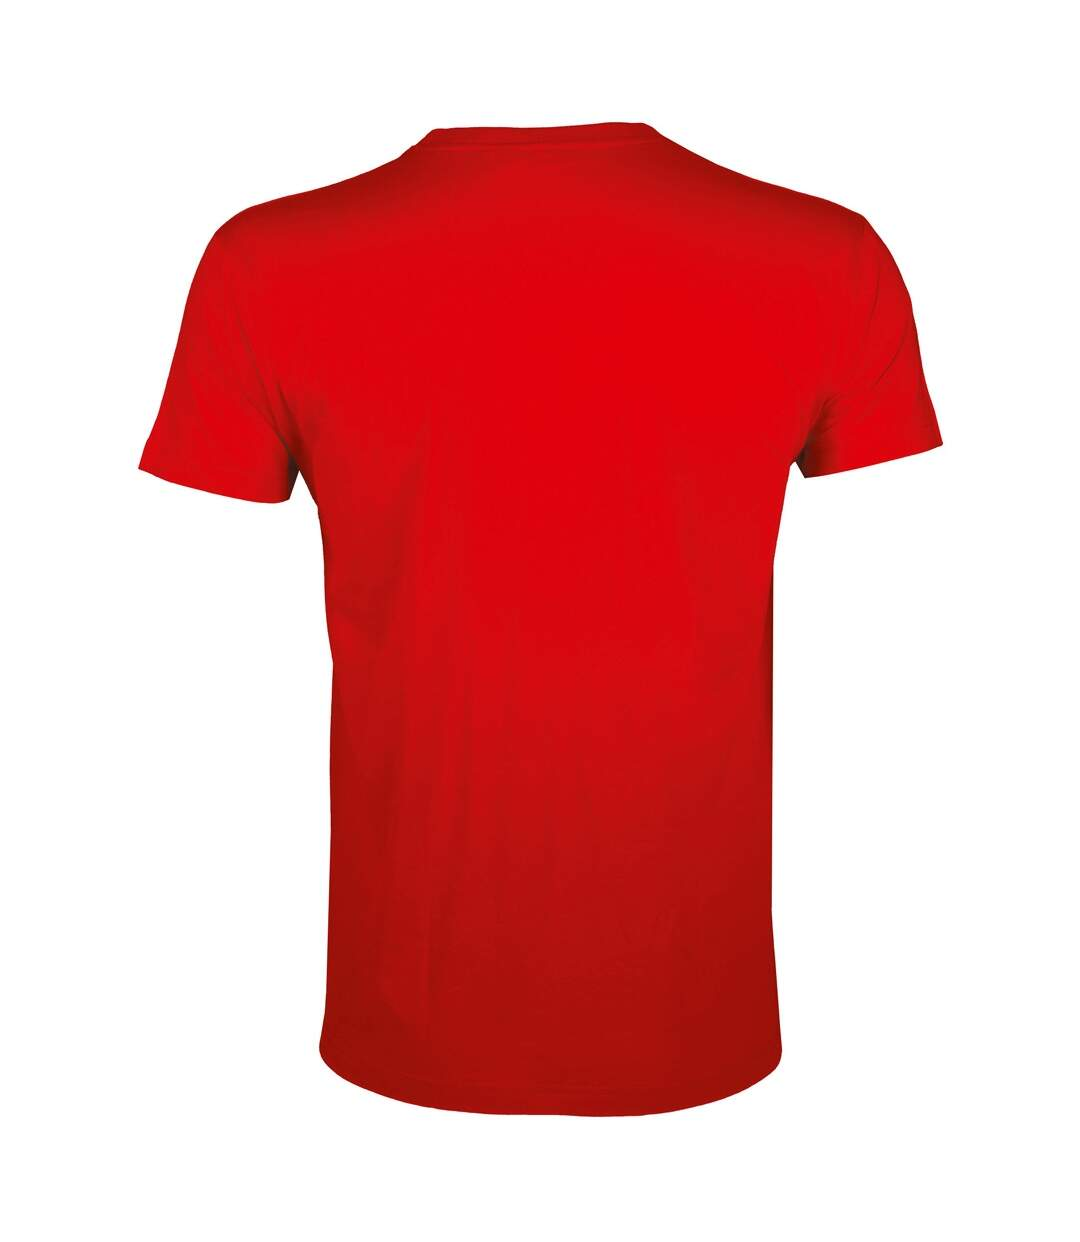 SOLS Mens Regent Slim Fit Short Sleeve T-Shirt (Red) - UTPC506